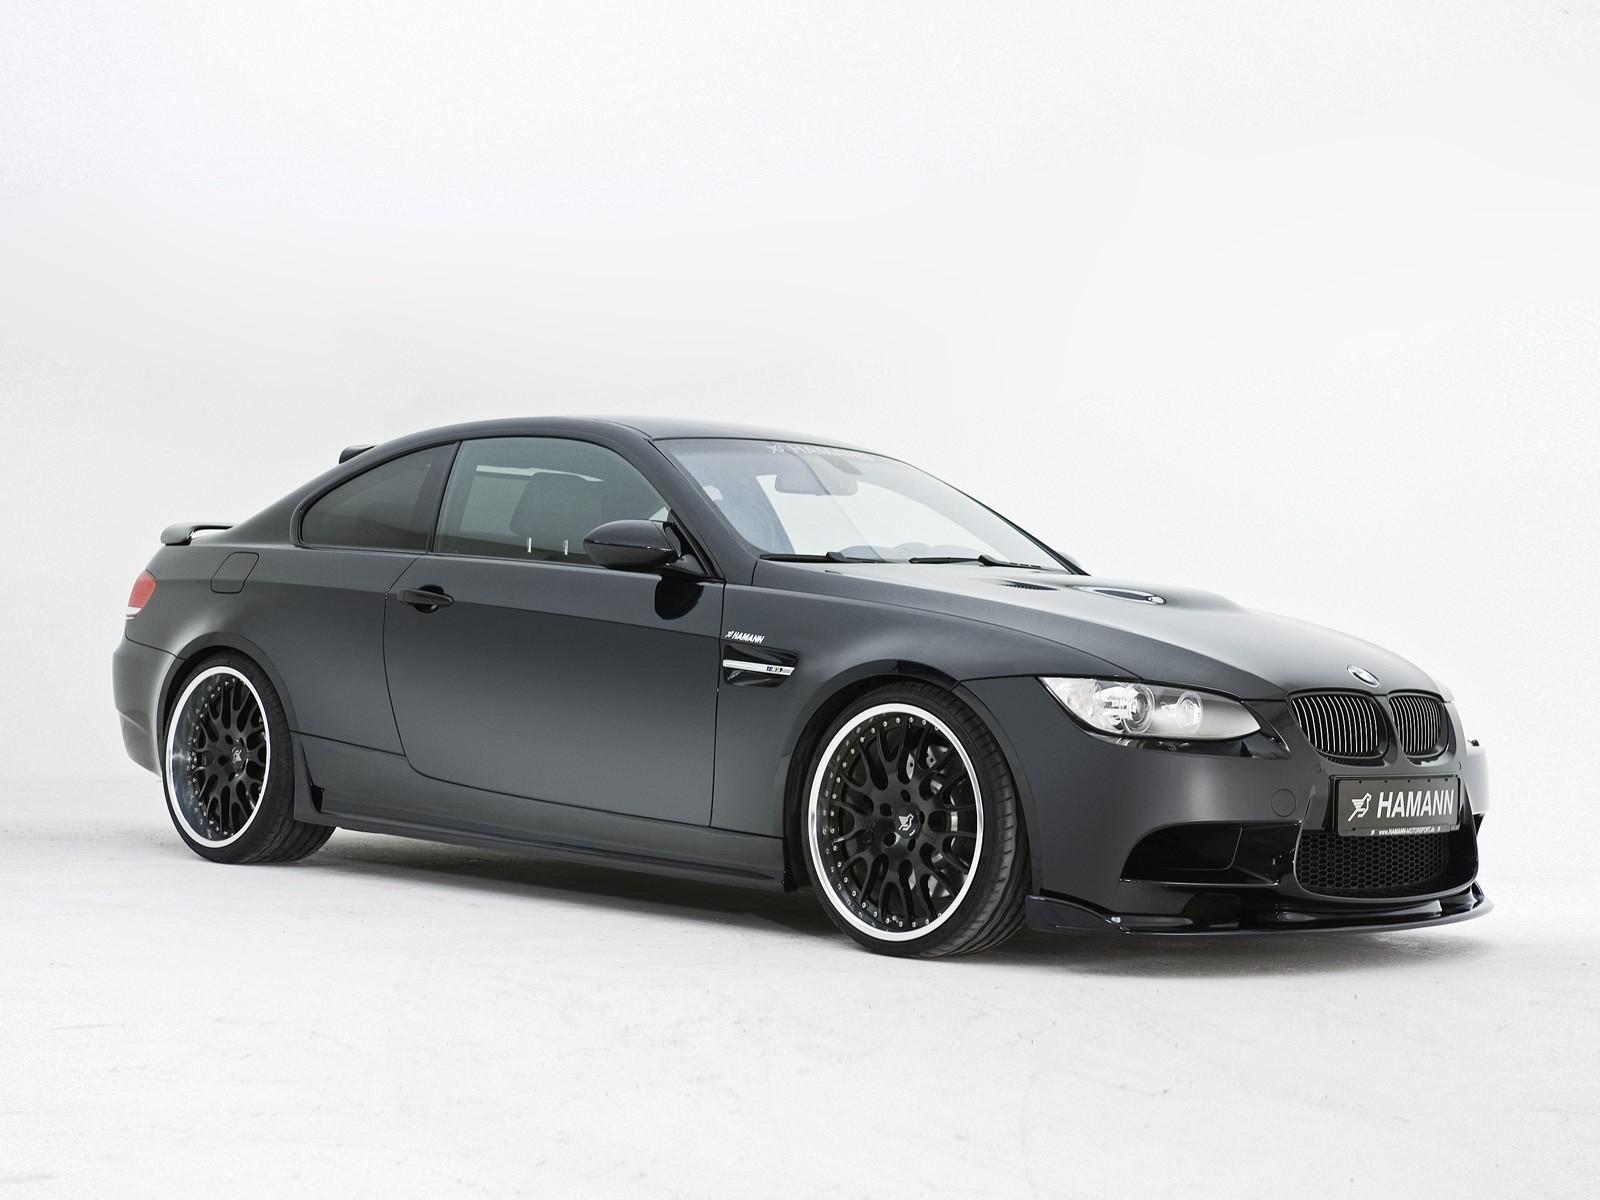 Description BMW M3 Wallpapers is a hi res Wallpaper for pc desktops 1600x1200